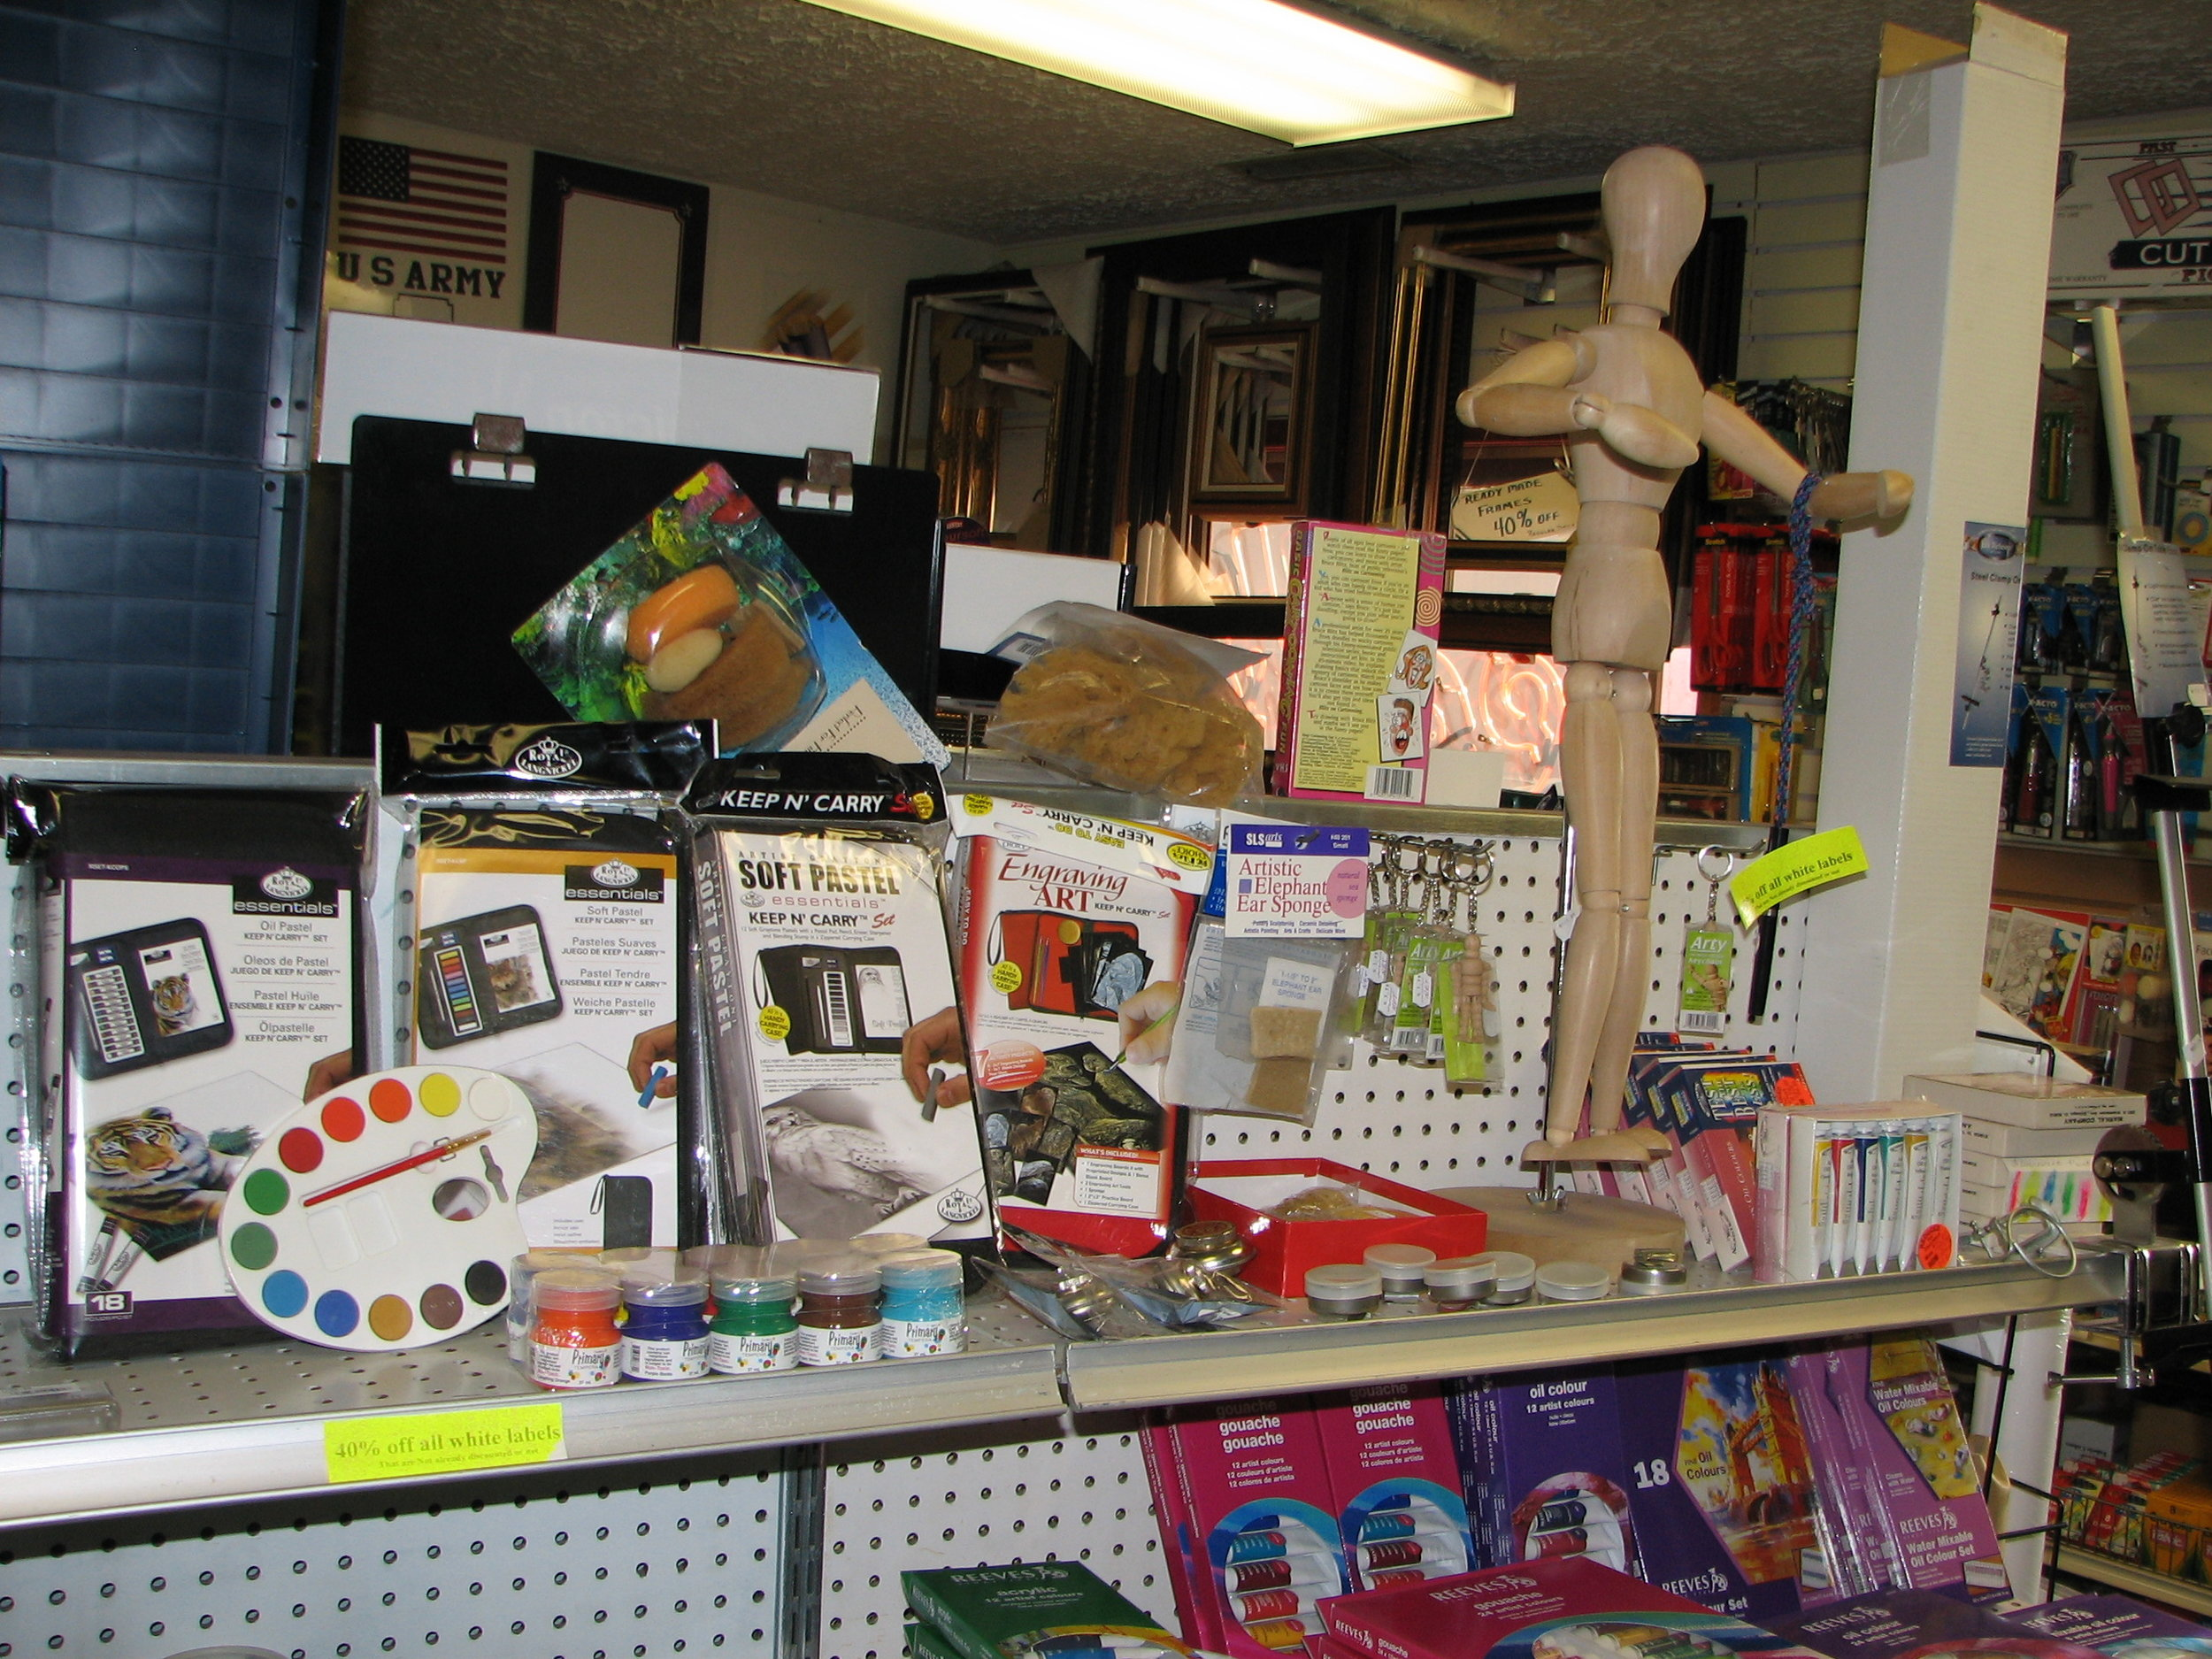 Paint, drawing kits, People Manikins,Dog Manikins,Cat Manikins